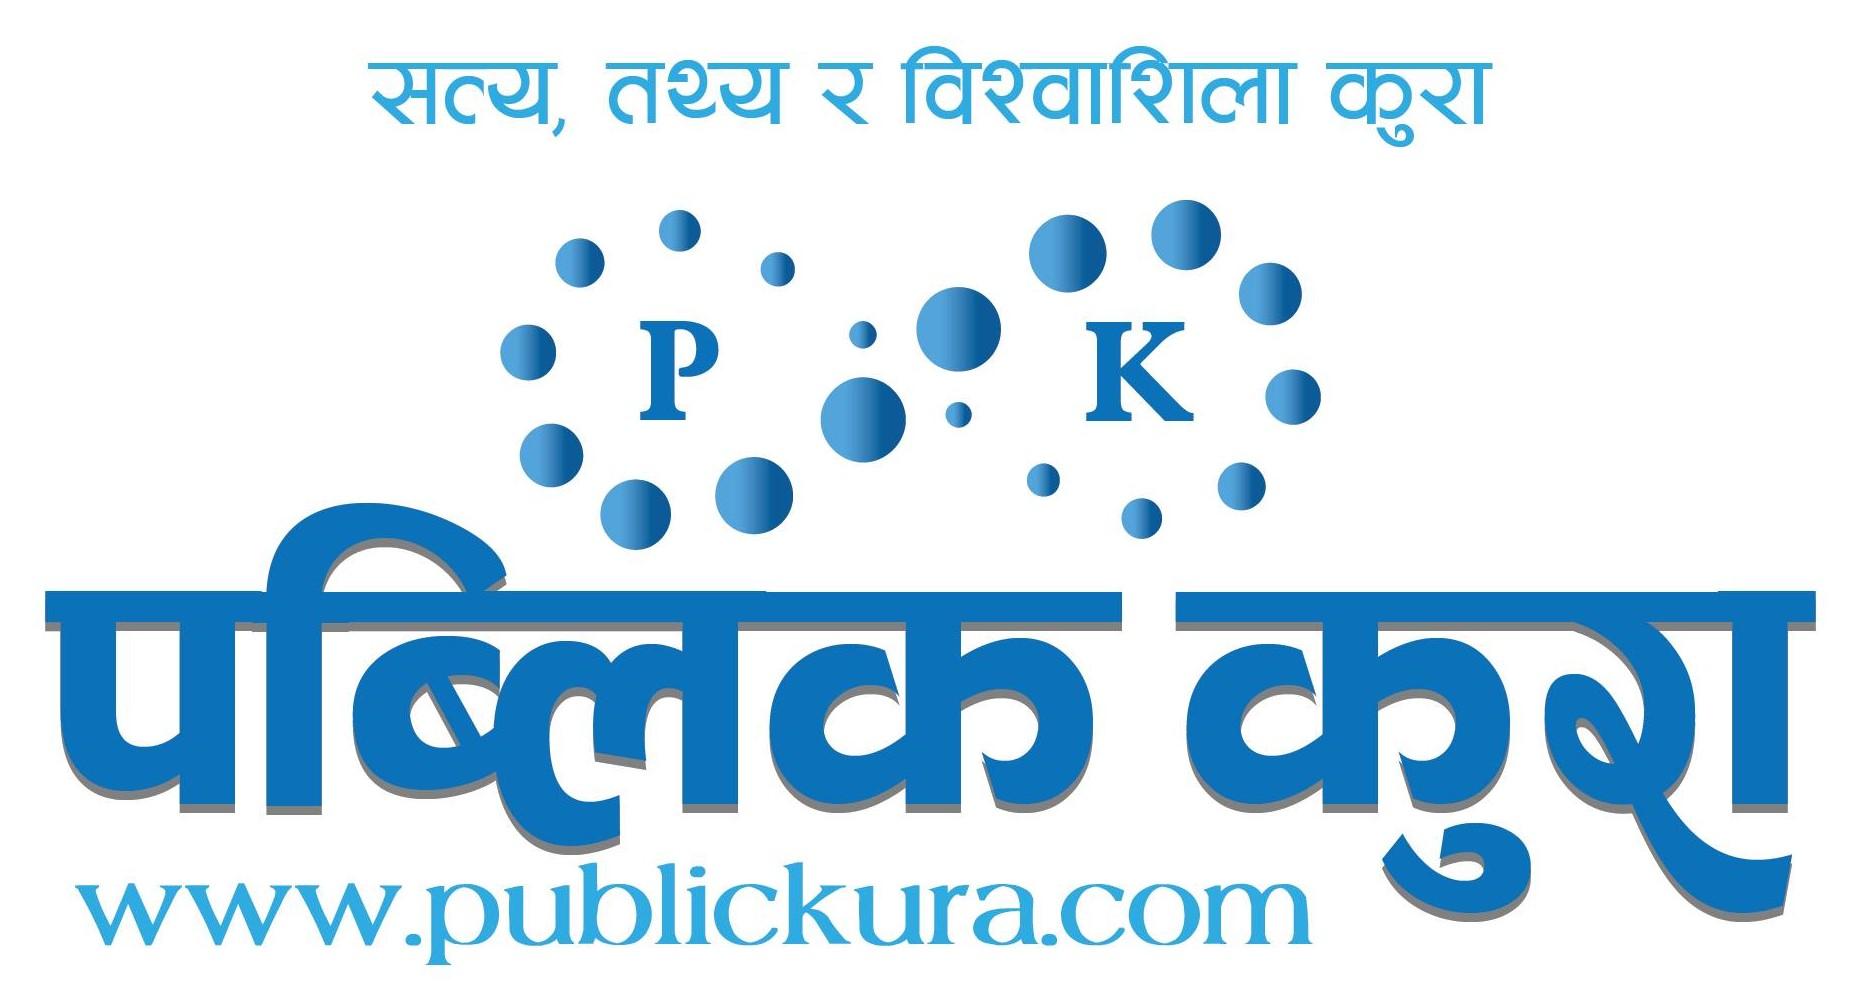 Public Kura